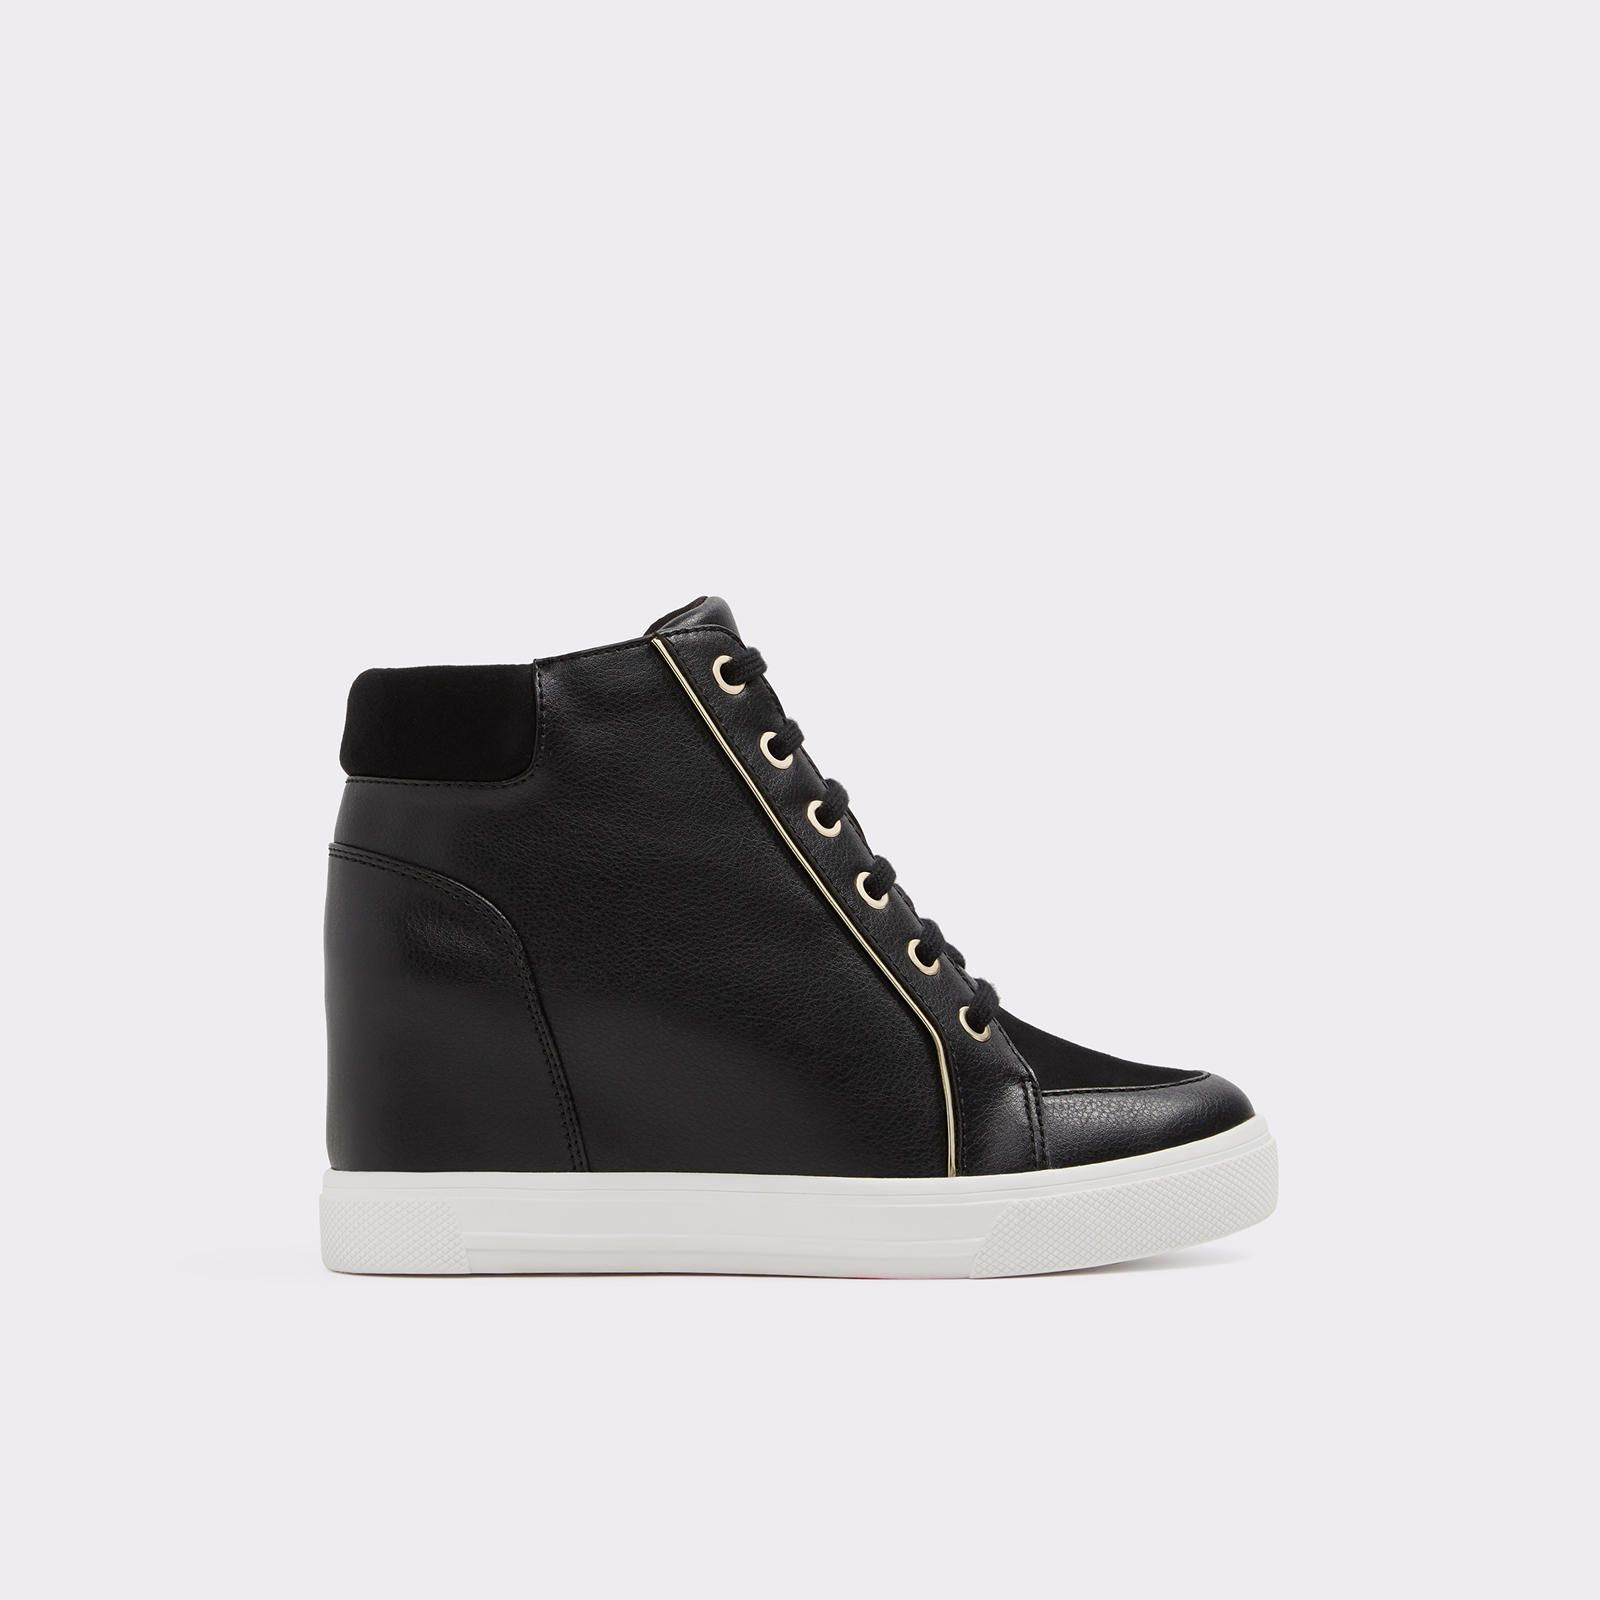 Aderadda | Minimalist shoes, High heel tennis shoes, Shoes